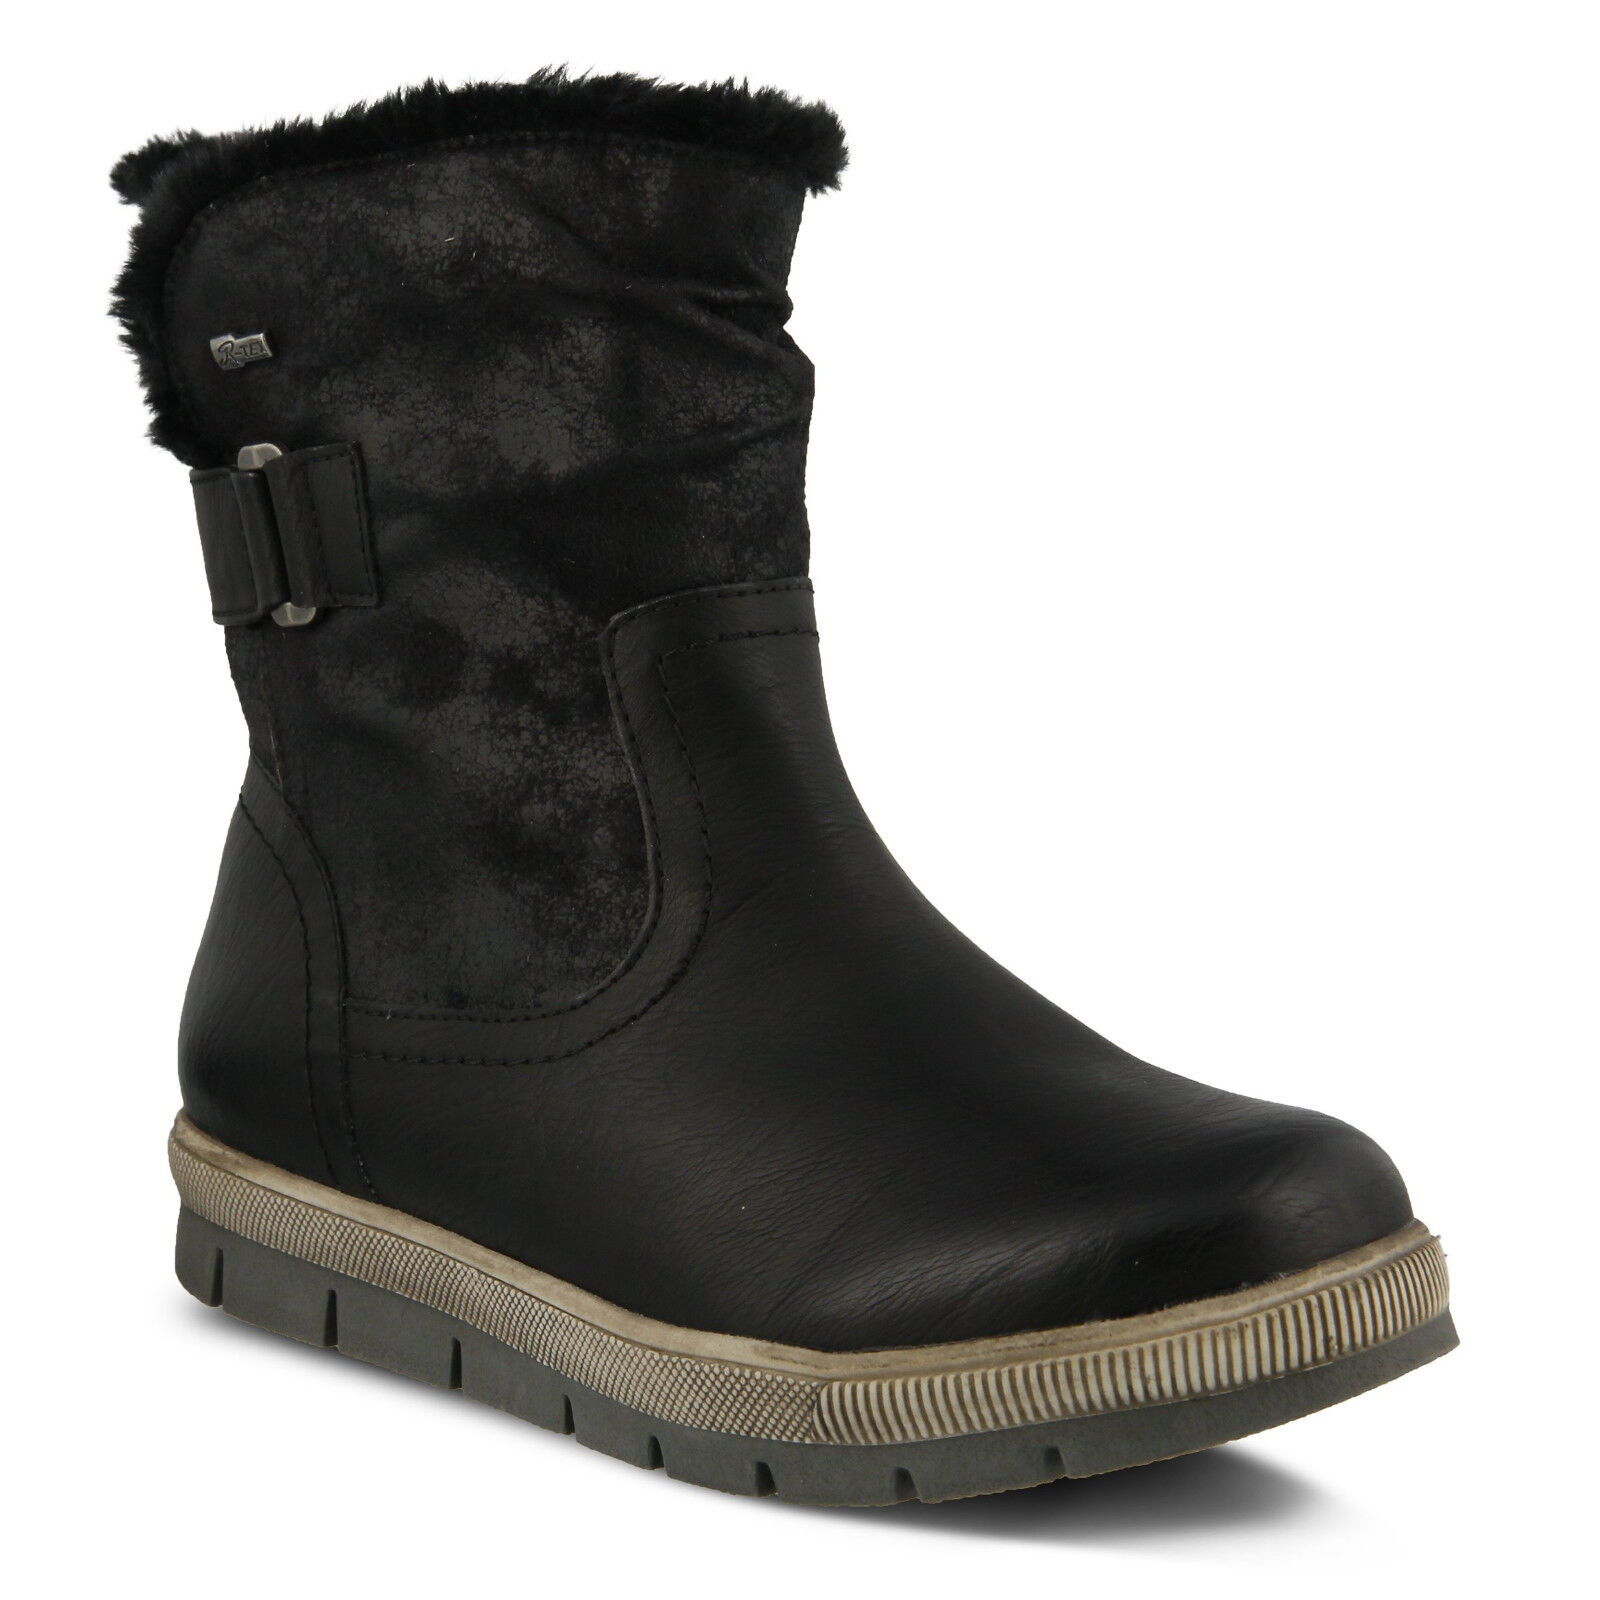 Spring Step Yamma Black Vegan Leather Winter Snow Boots Womens EU 39   8.5